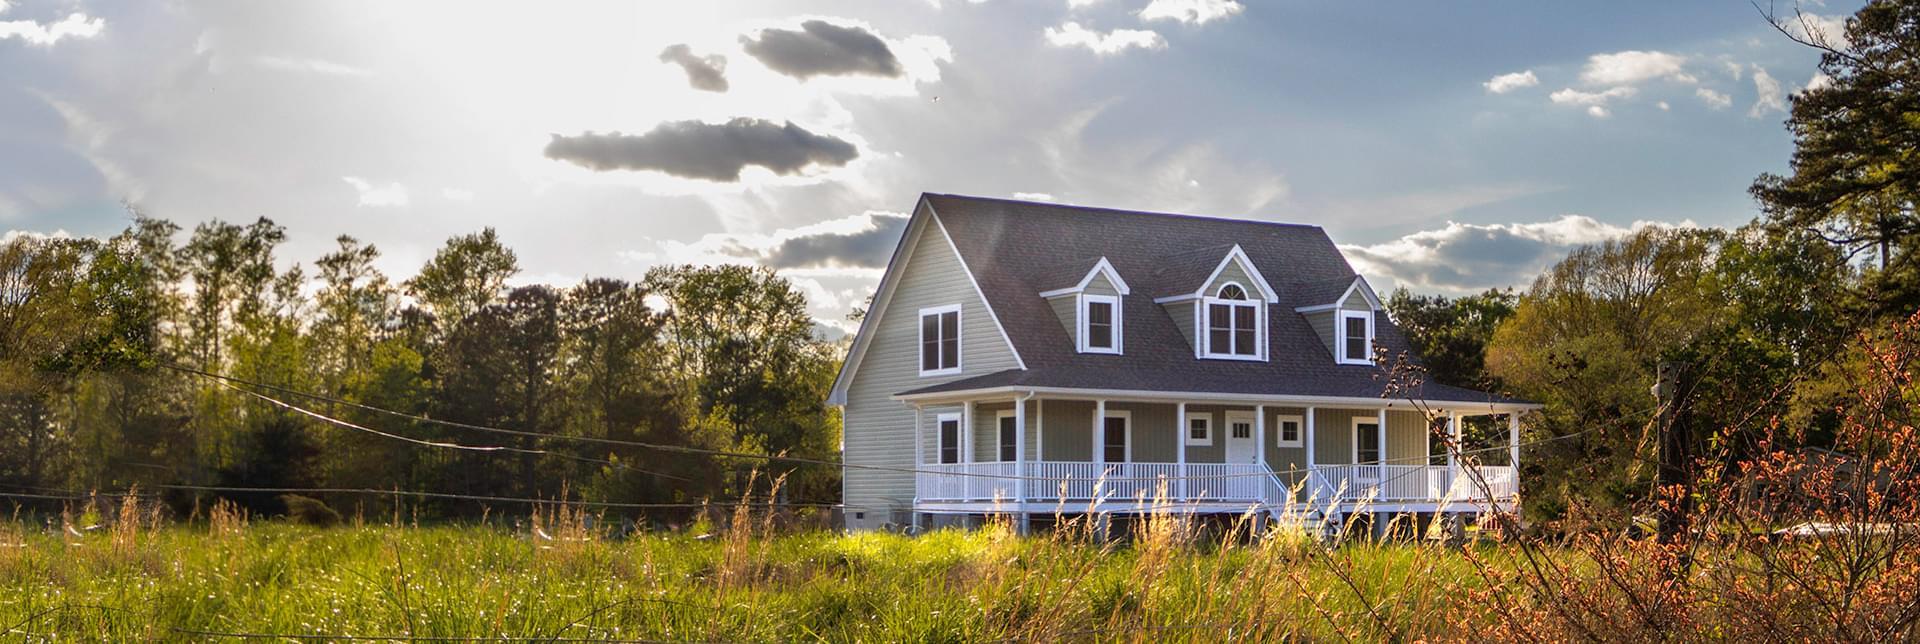 New Homes in Hopewell VA